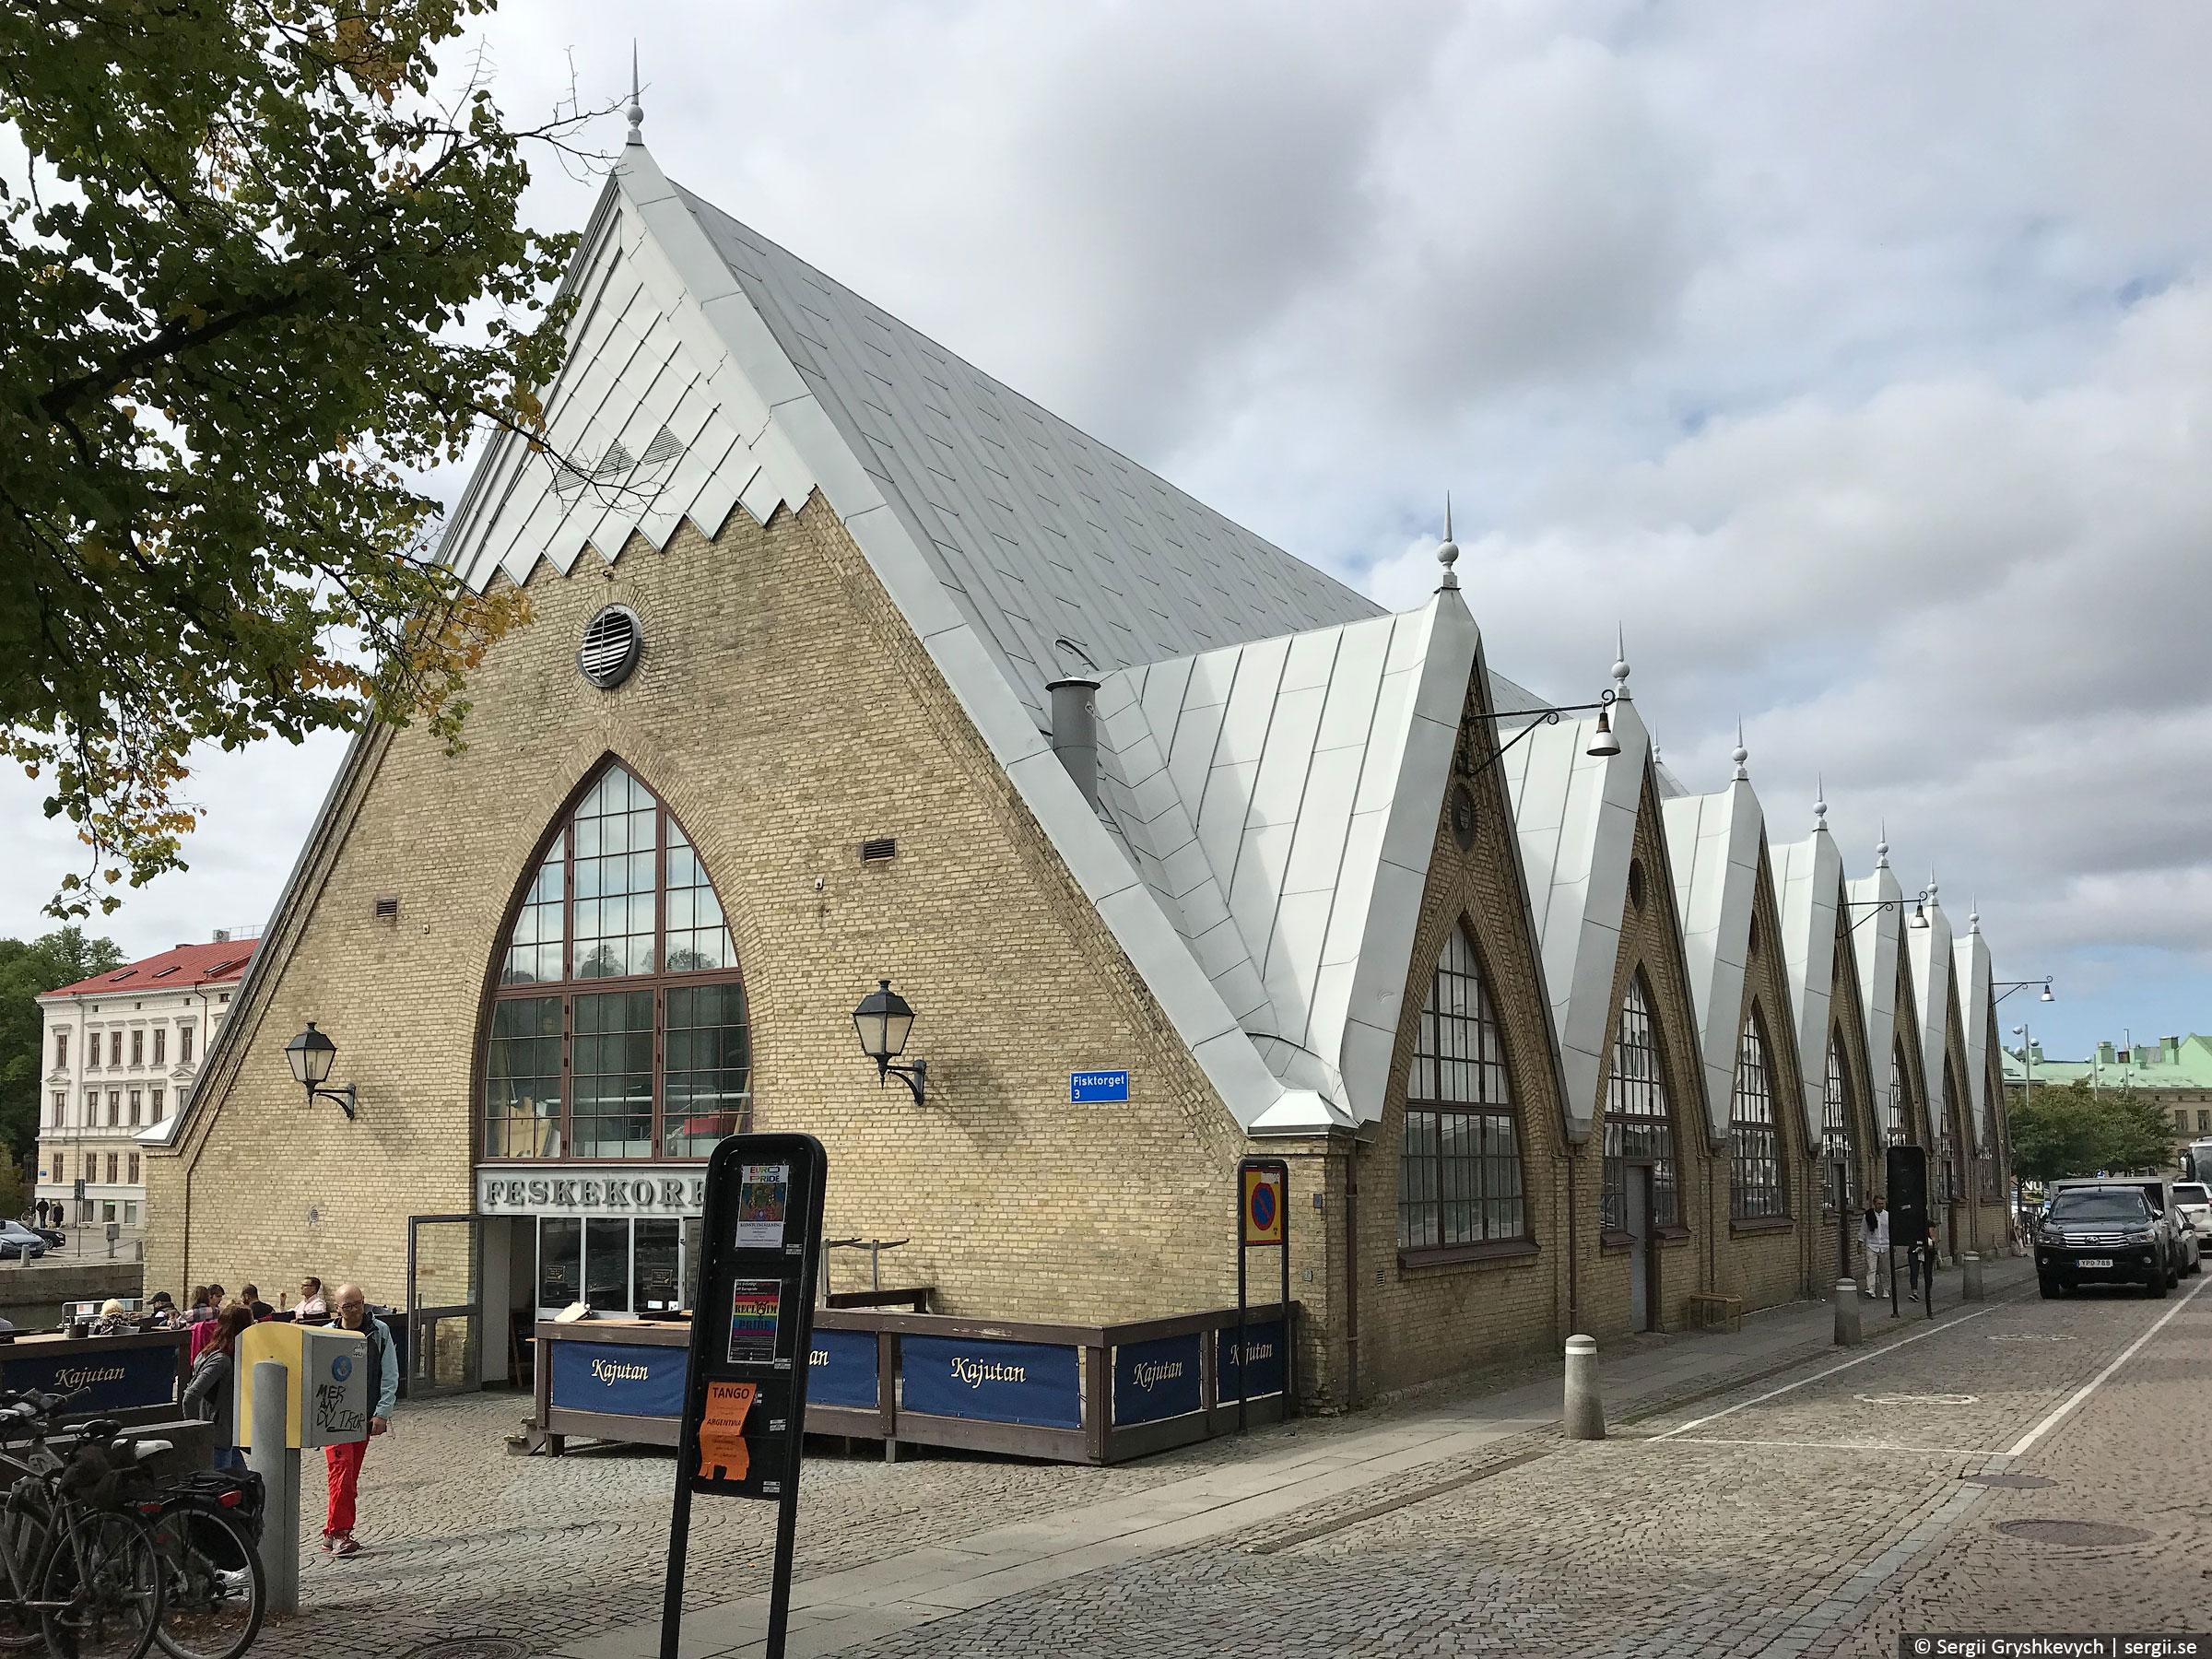 göteborg-ghotenburg-sweden-2018-37